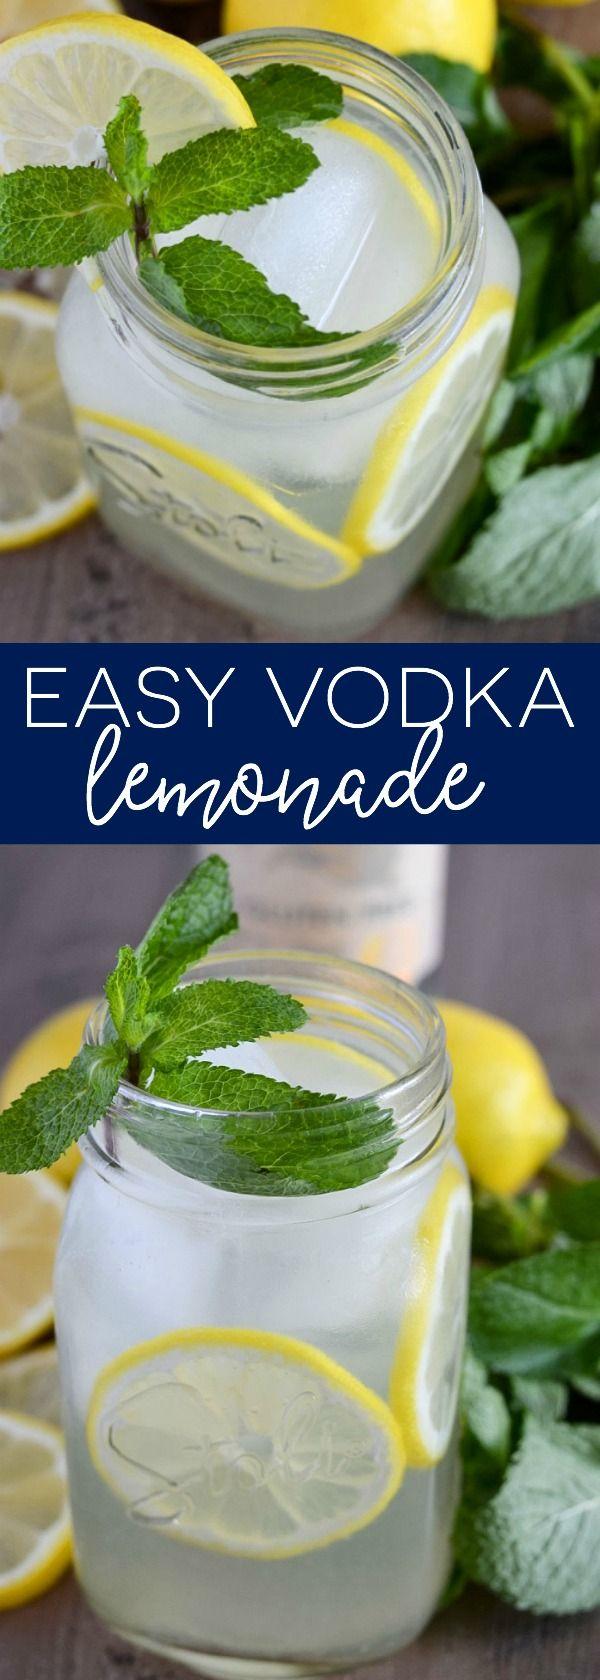 Easy Vodka Lemonade from What The Fork Food Blog | whattheforkfoodblog.com | Sponsored by Stoli gluten free.